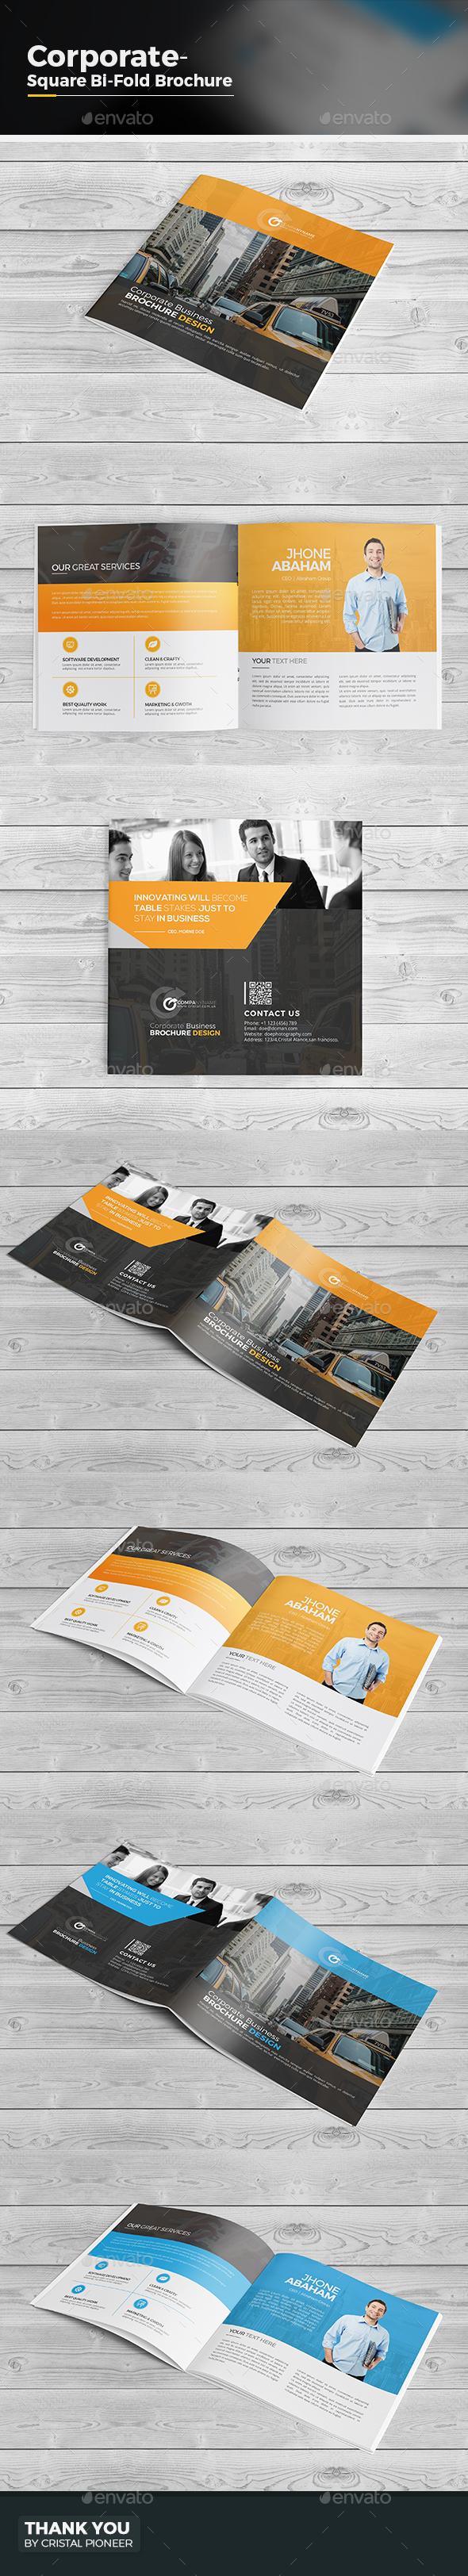 Bi Fold Square Brochure - Corporate Brochures